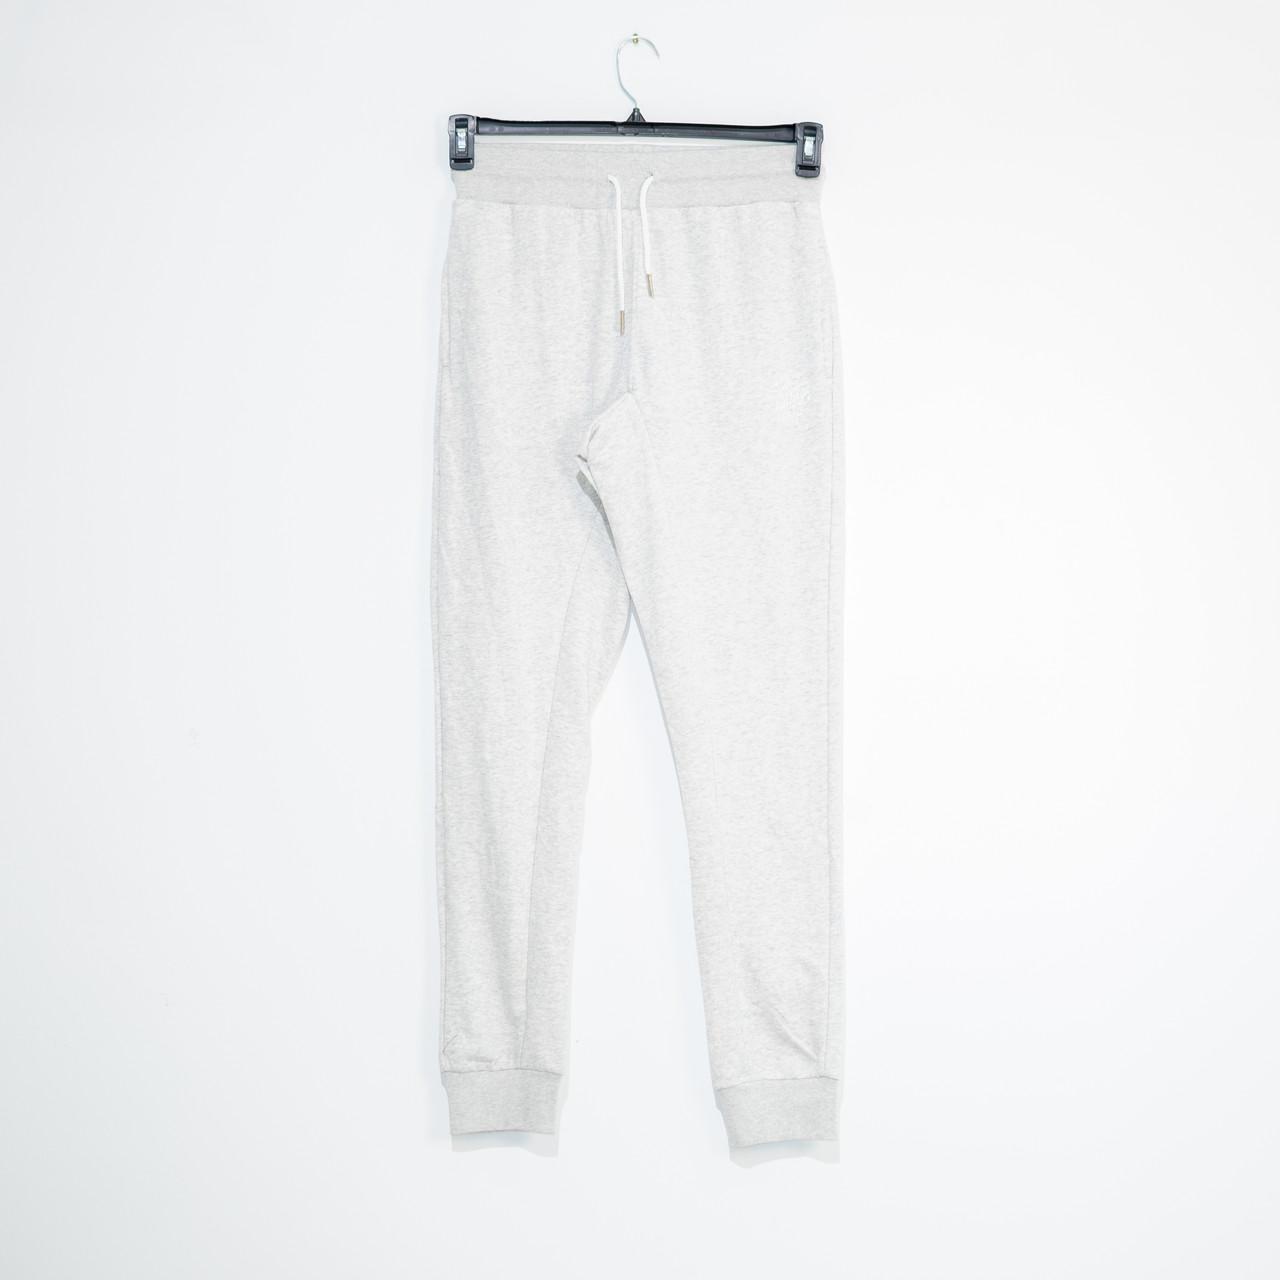 CATBALOU Мужские штаны 4115511405056